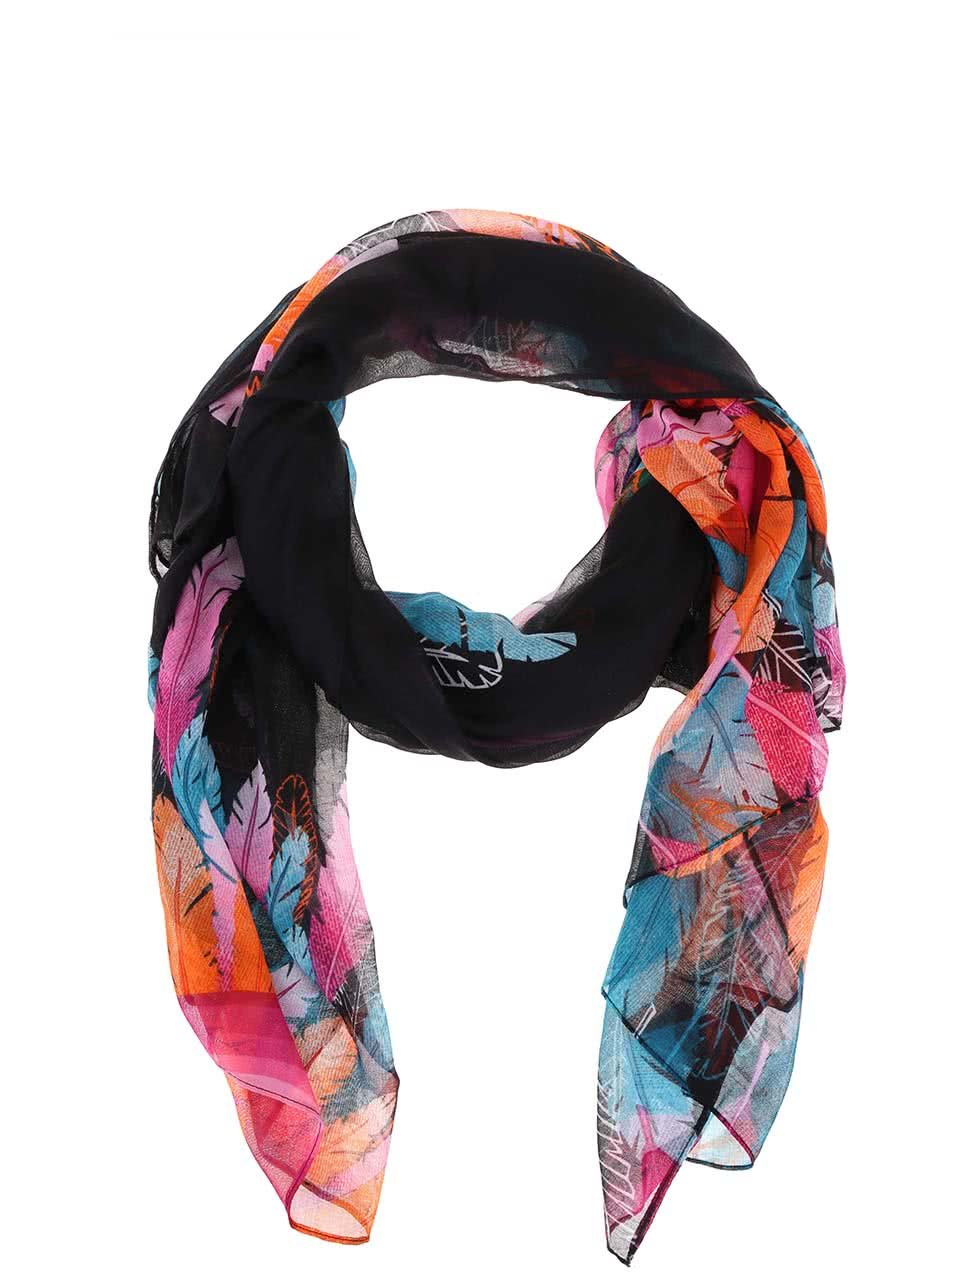 Čierna šatka s farebnými vzormi Desigual Rectangle Far West ... aab32c70931